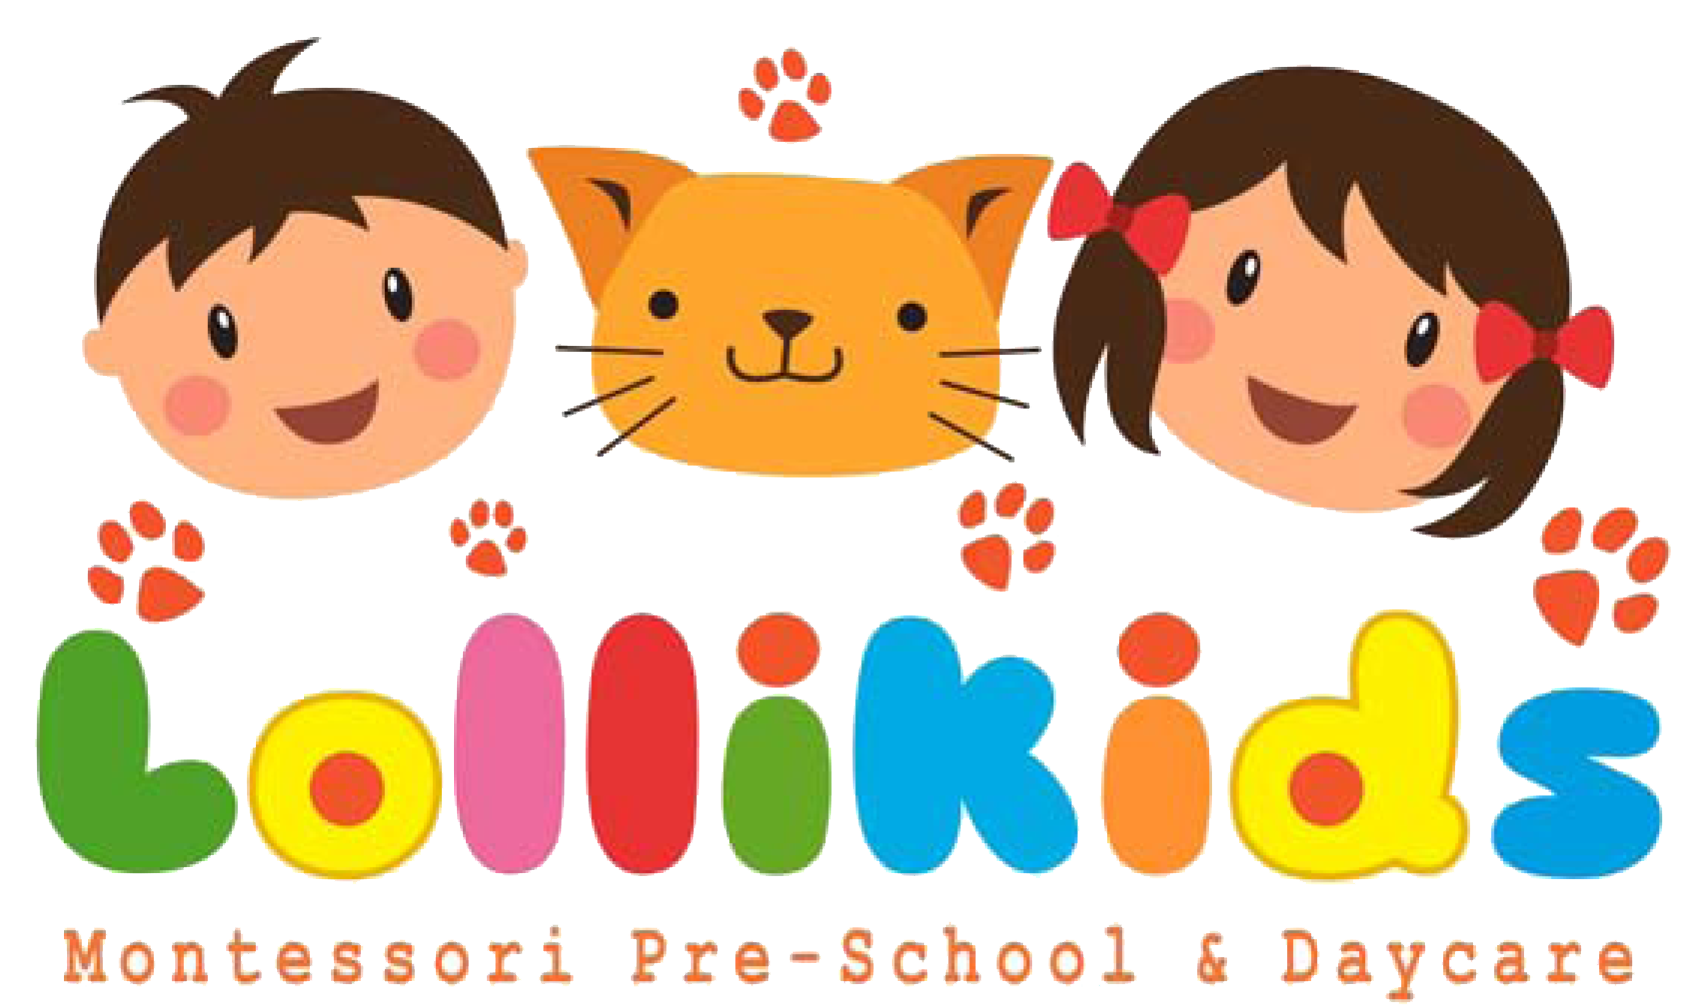 Lollikids official website copyright. Hug clipart nurturing